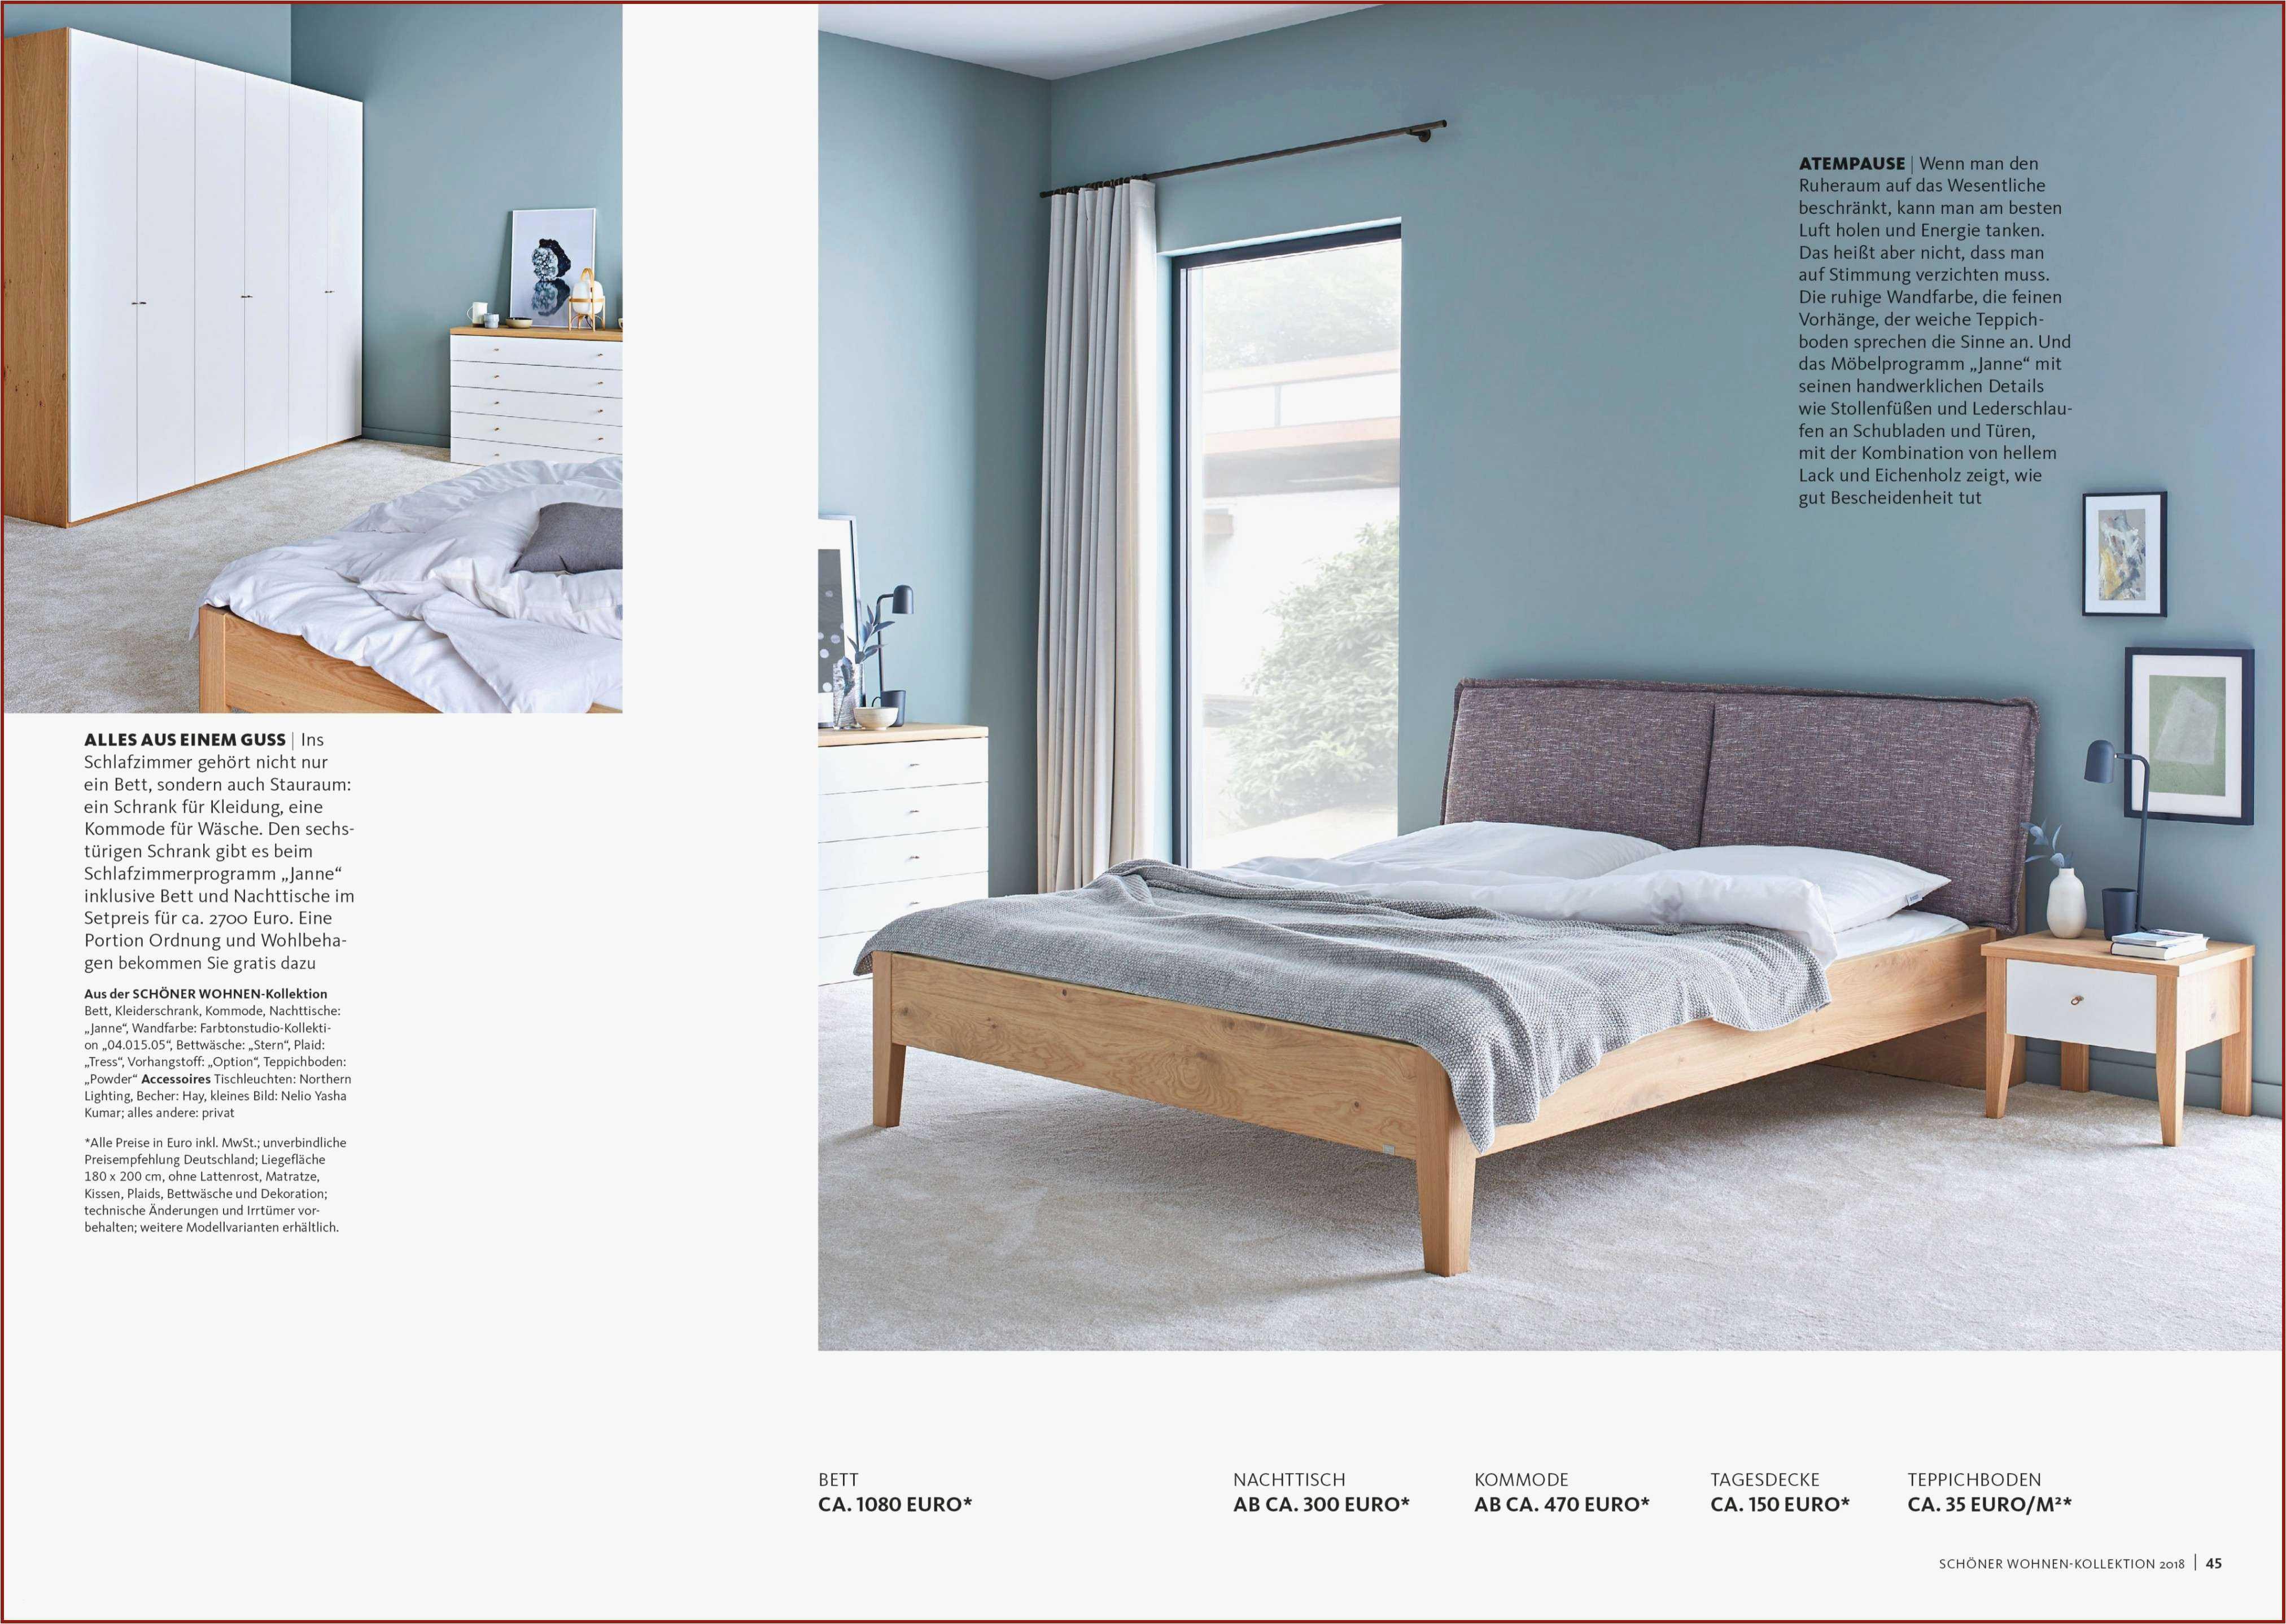 ikea bad schrank einzigartige table 200 cm awesome plaid sofa bed luxury tagesdecke sofa best of